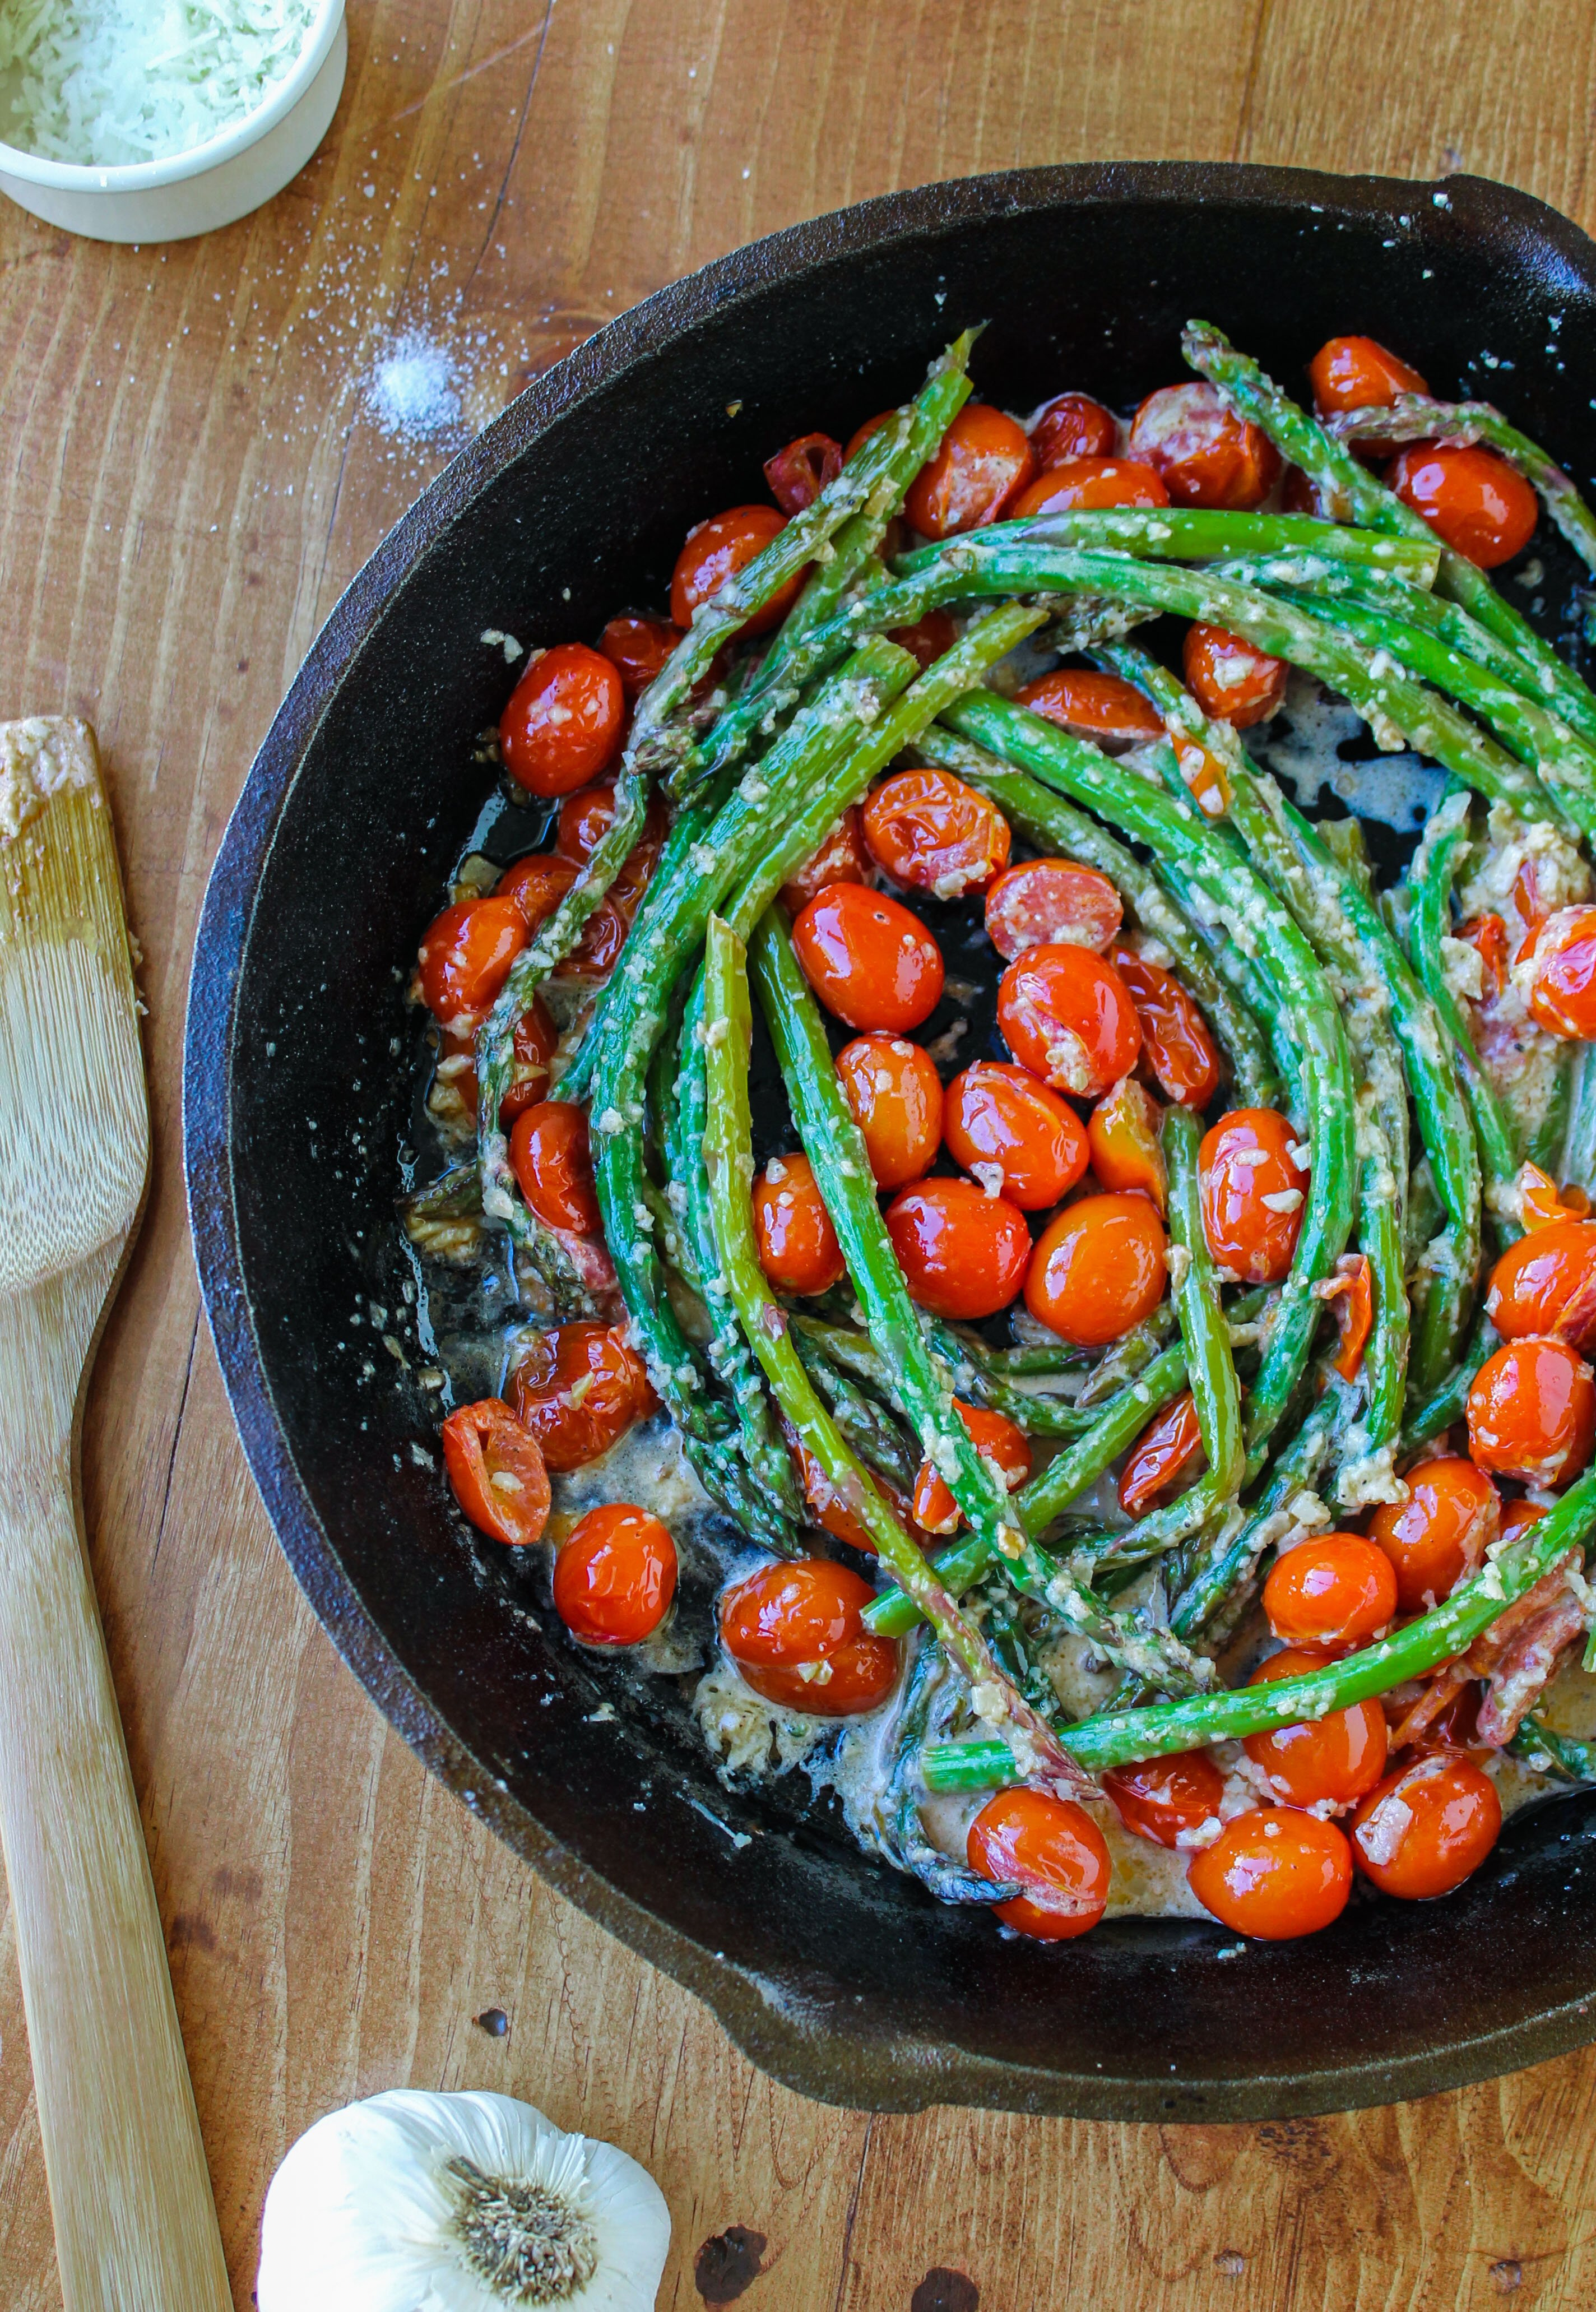 Saut 233 Ed Asparagus And Cherry Tomatoes The Food Charlatan